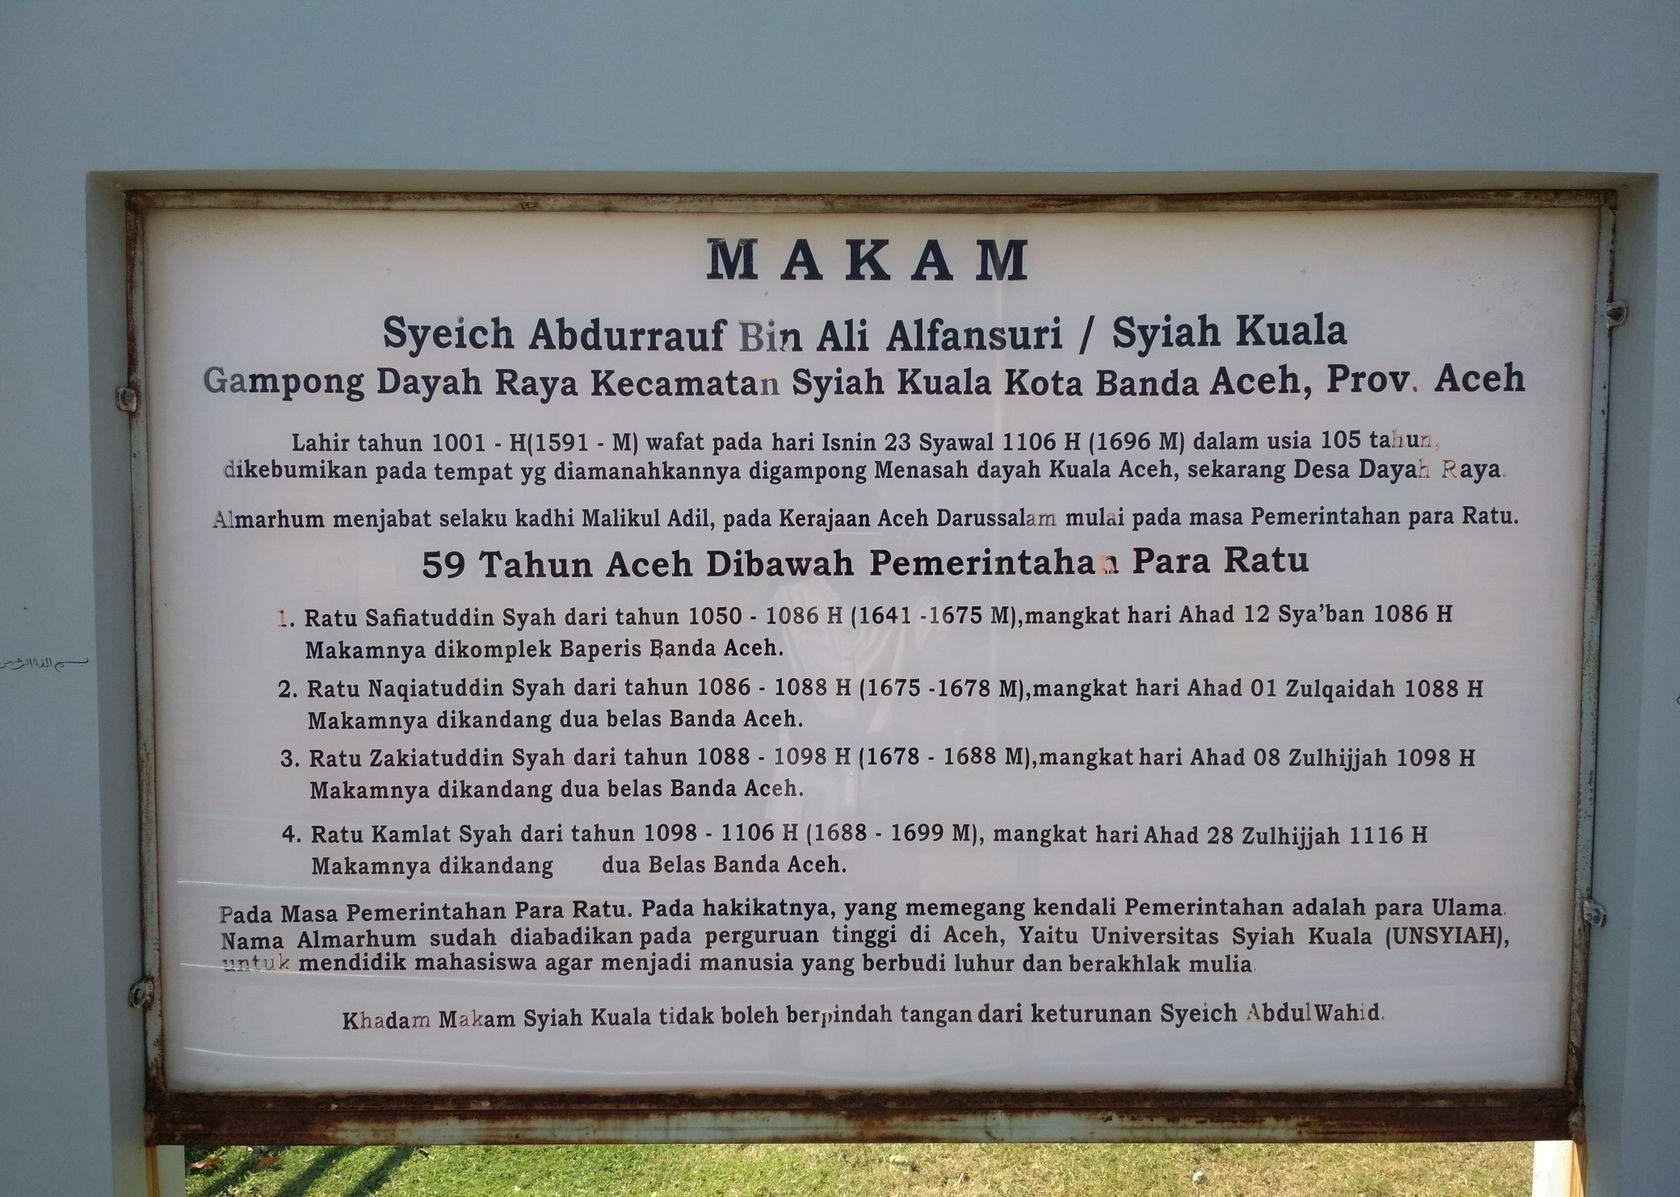 Berkunjung Makam Syiah Kuala Steemit Img 20180208 200135 Jpg Kota